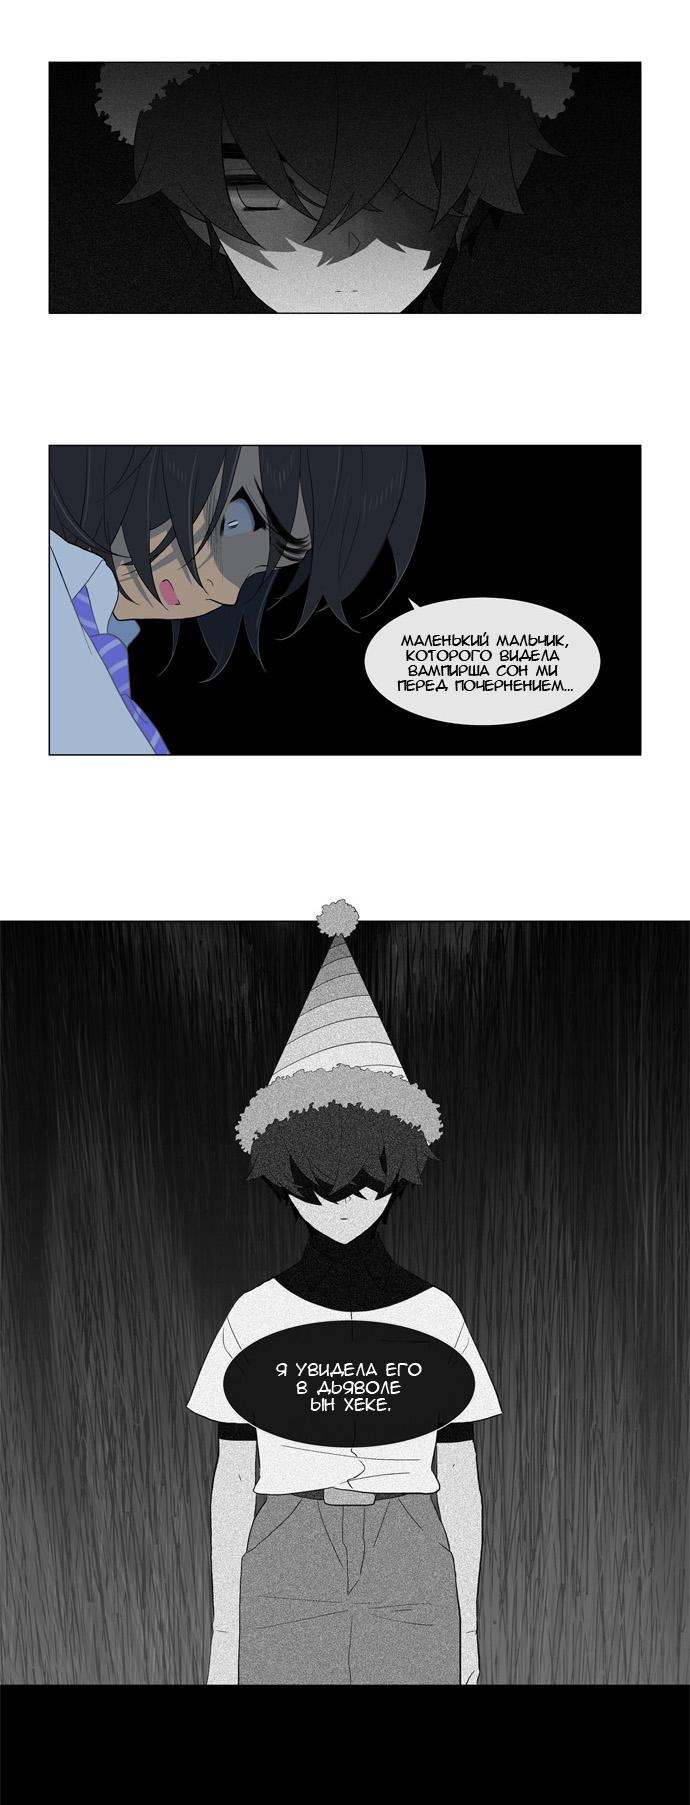 https://r1.ninemanga.com/comics/pic2/32/21344/207411/1427848146224.jpg Page 2